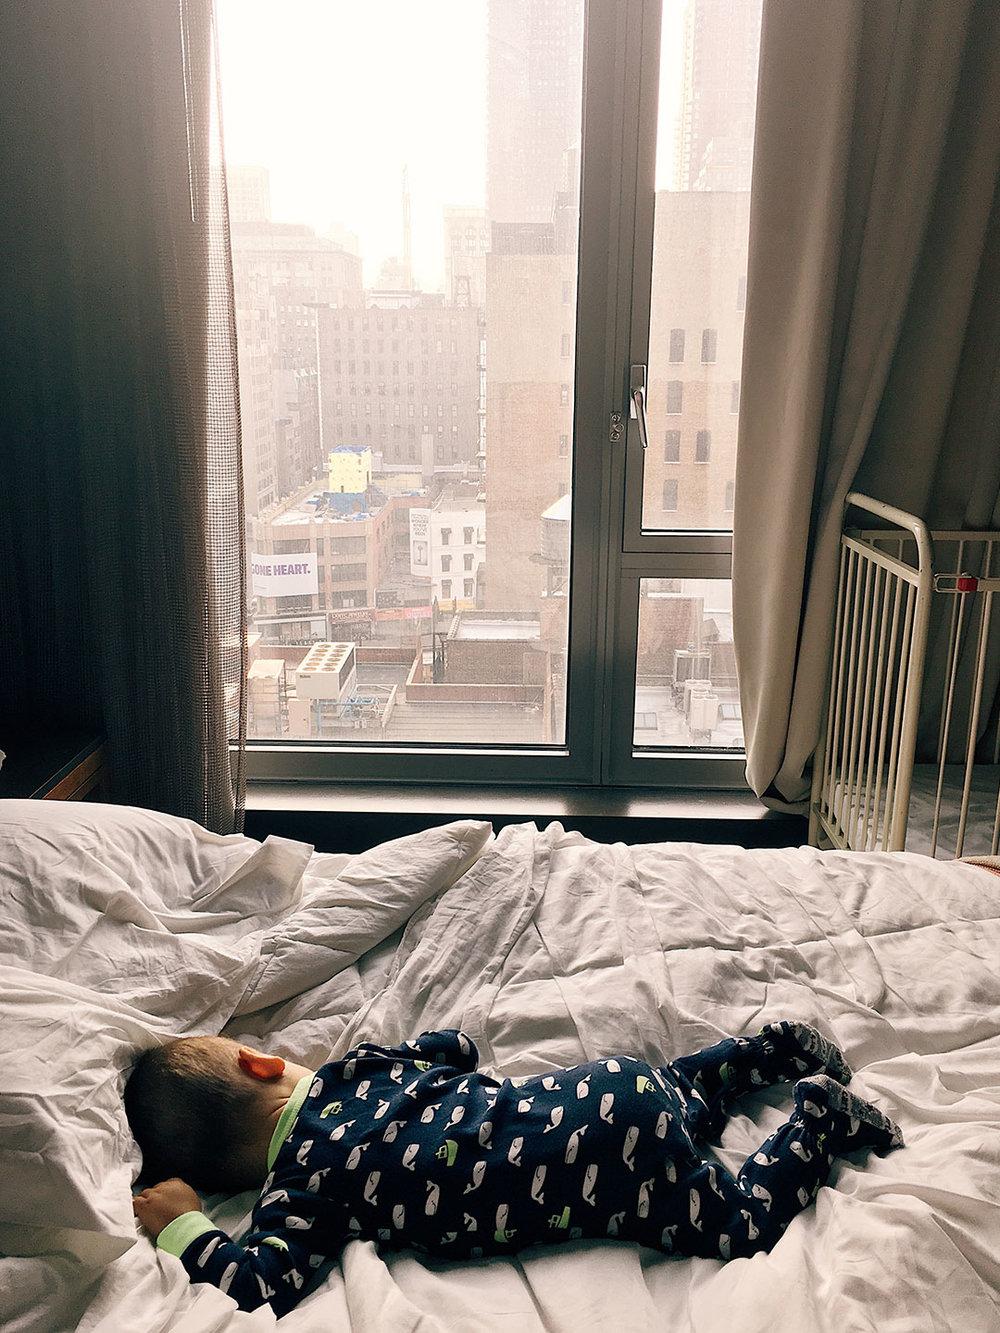 New_York_2017_13.jpg